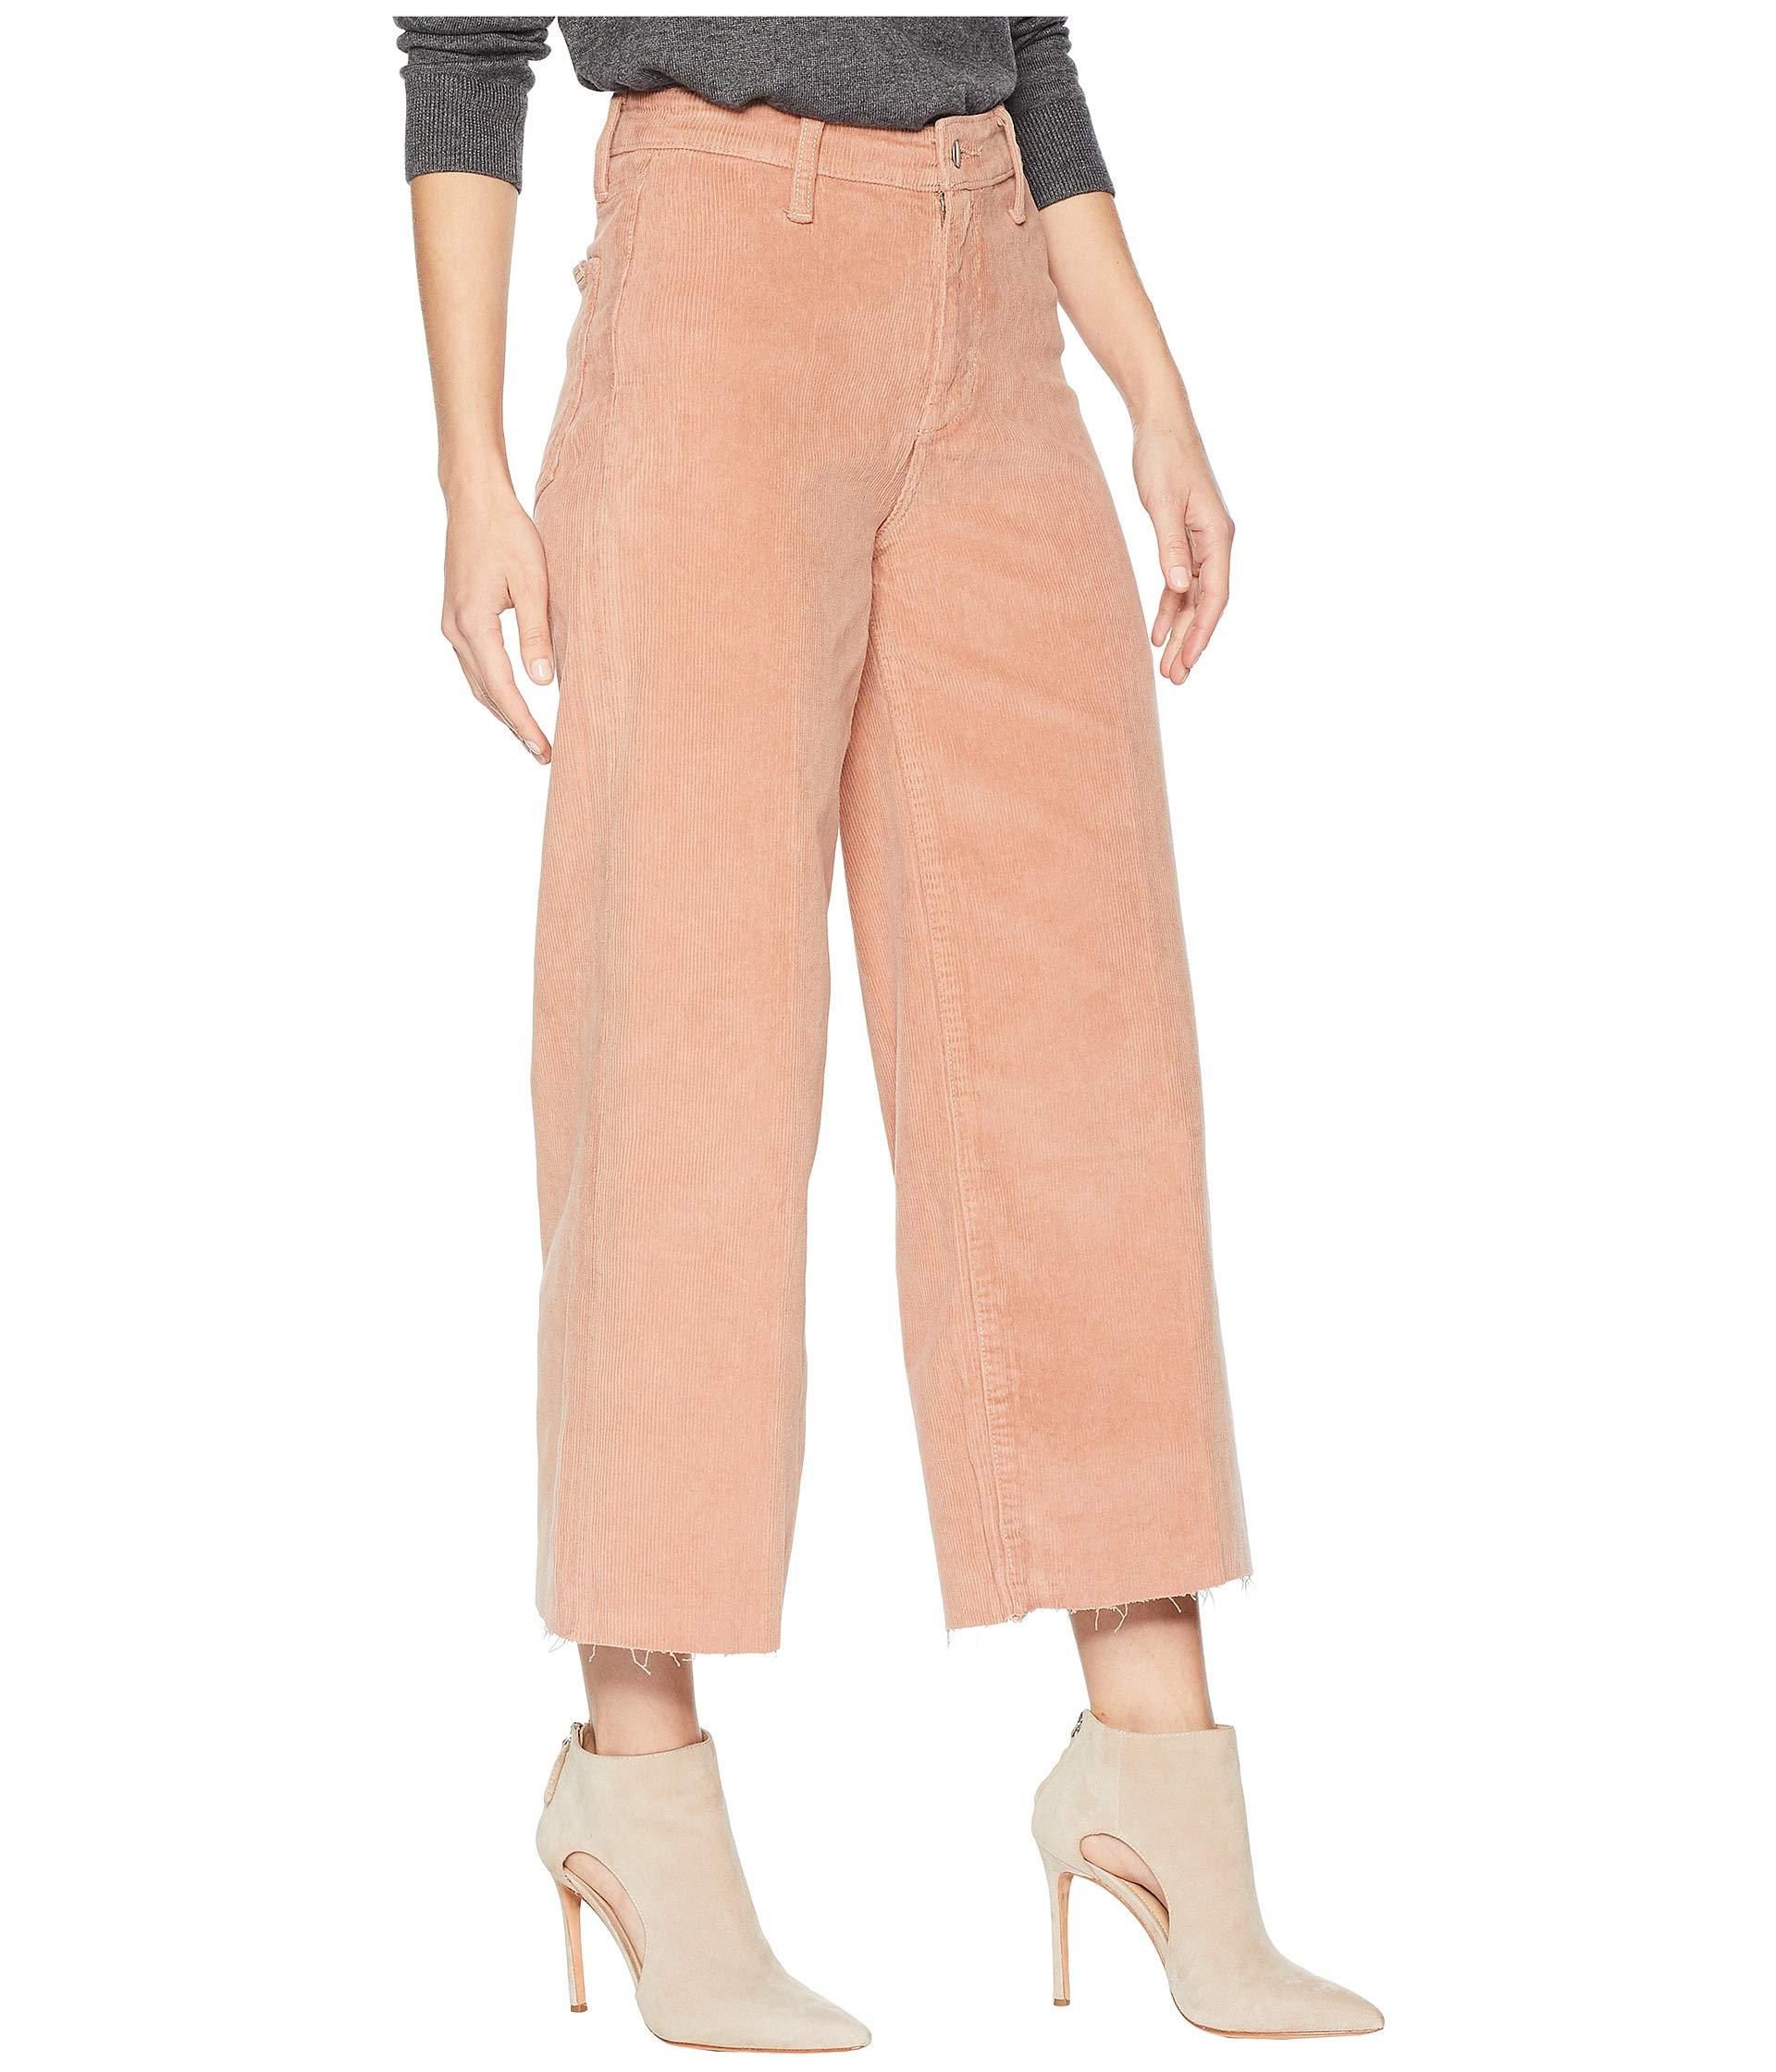 c796bc42d05 Jeans In Corduroy Latte Joe s Crop Flare dwIvywFqU5